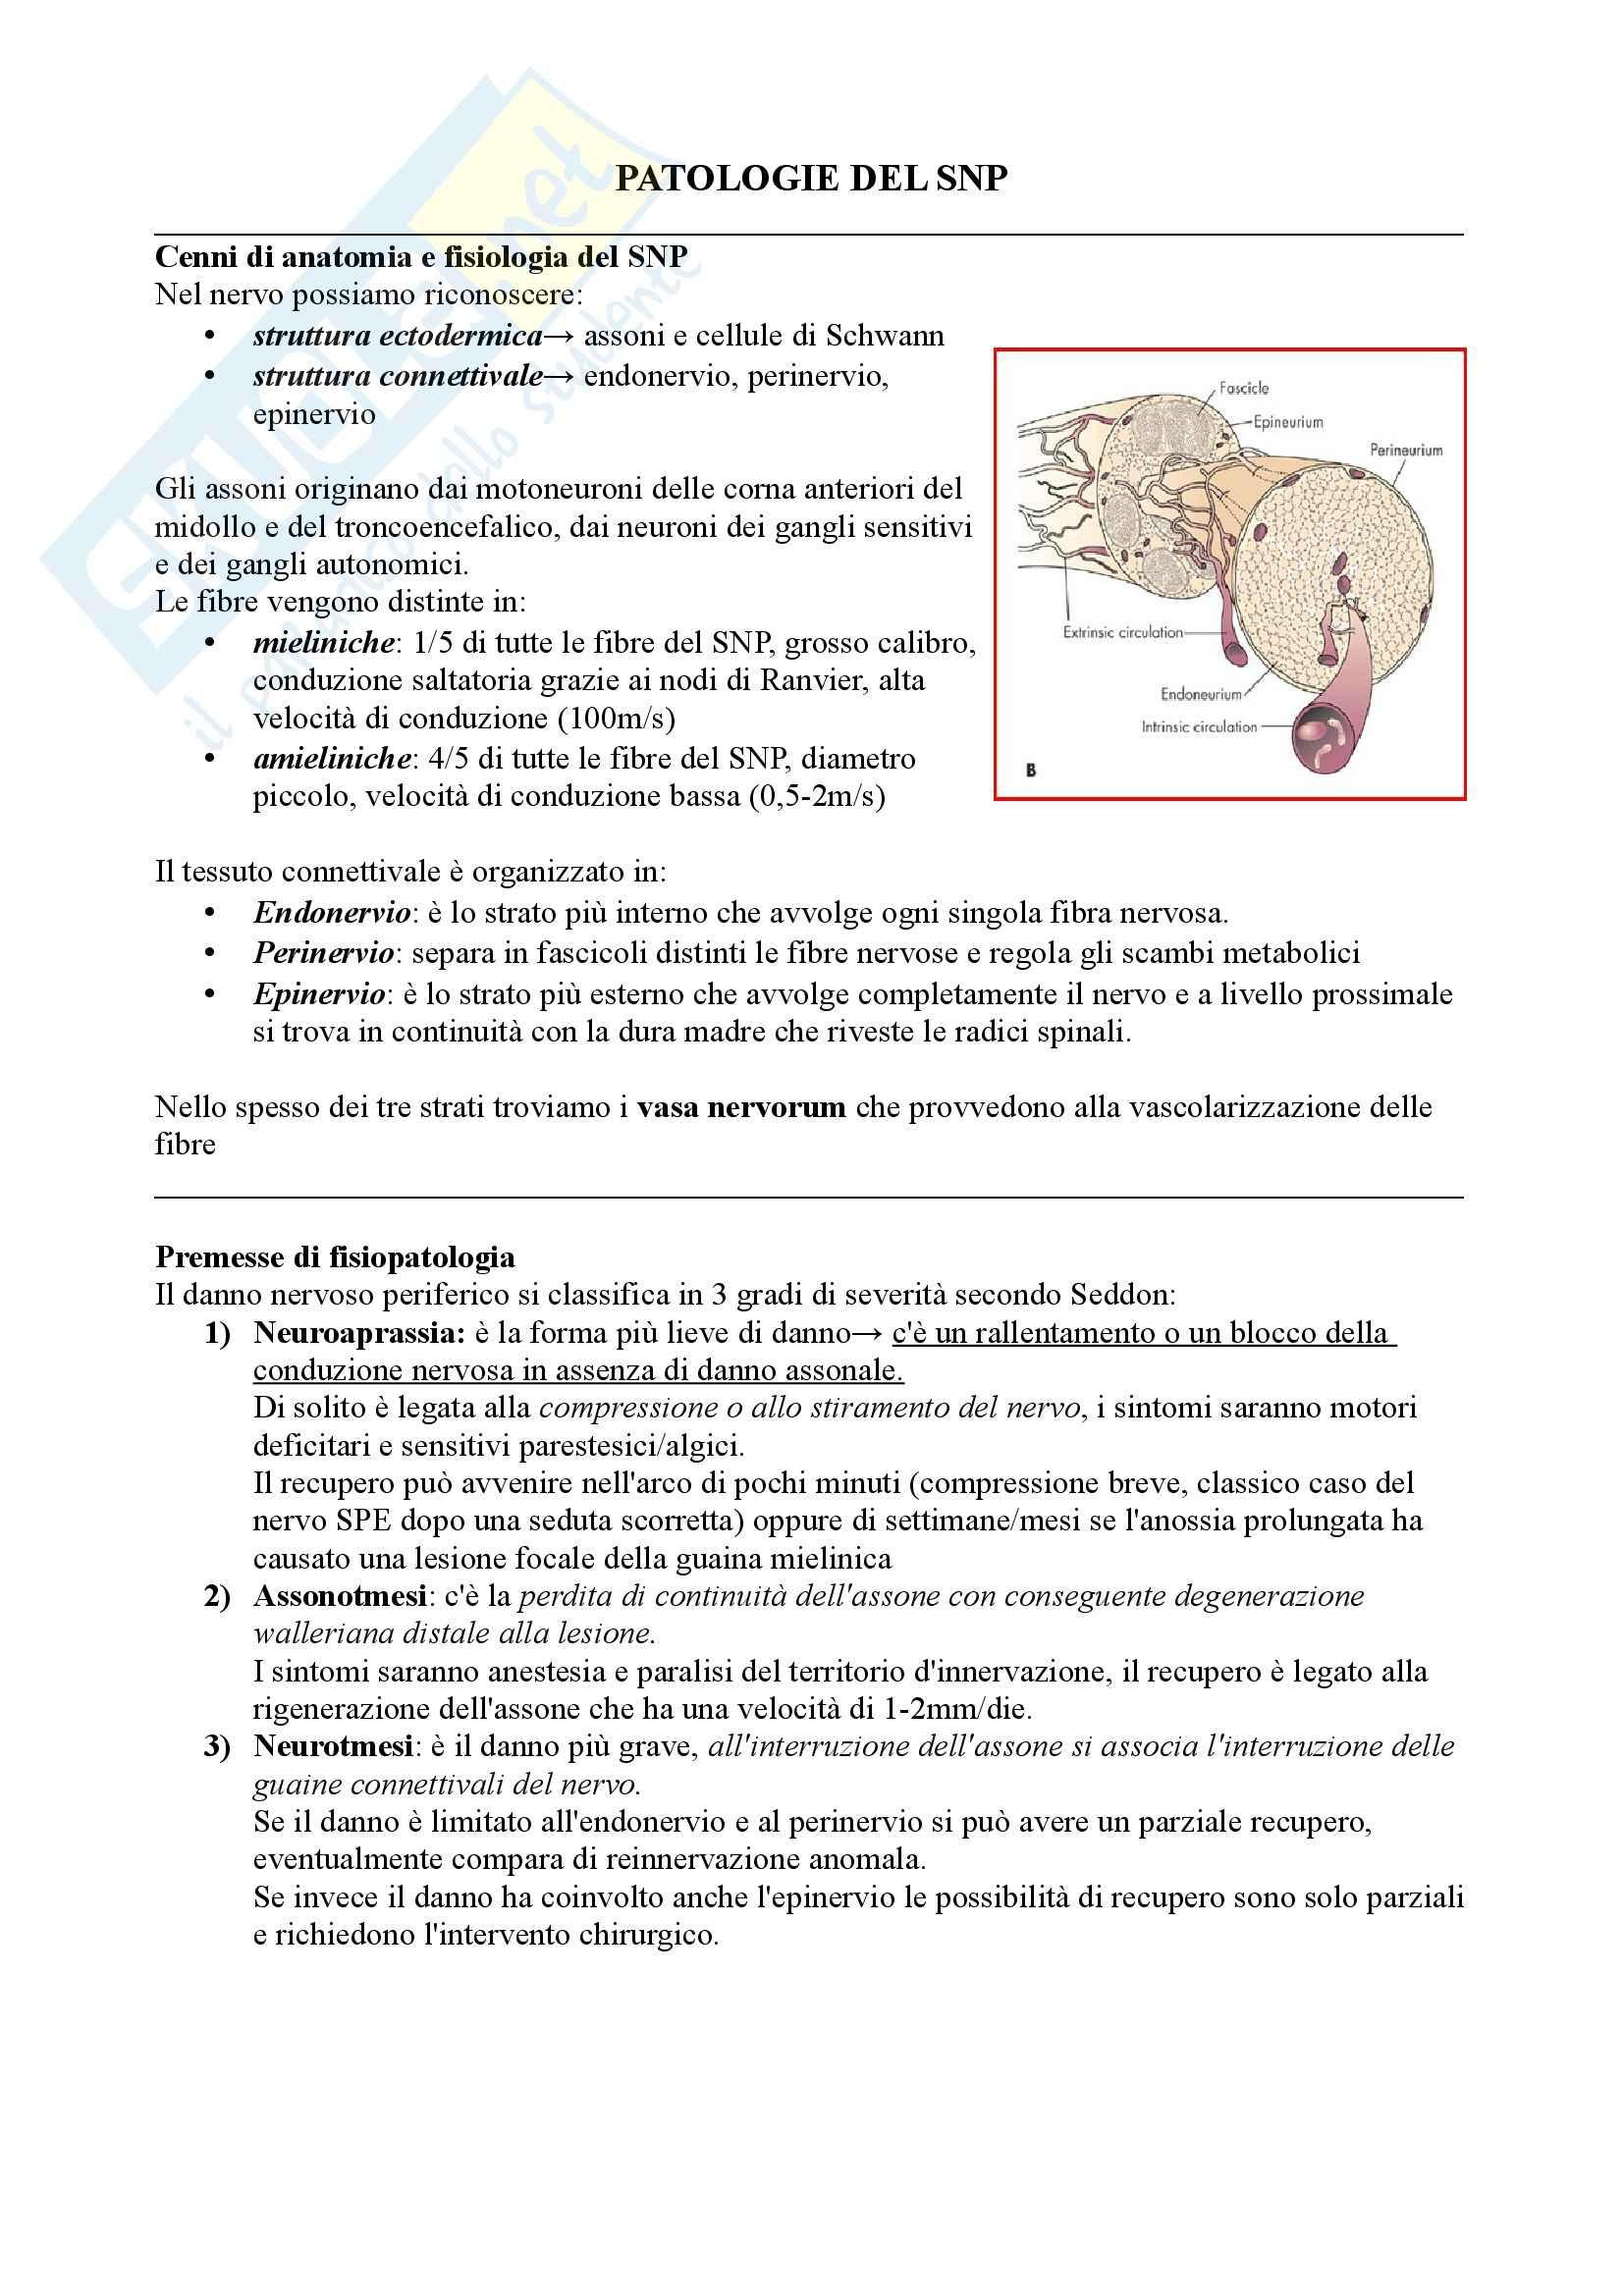 Patologie del Sistema Nervoso Periferico: Polineuropatie, Neurologia